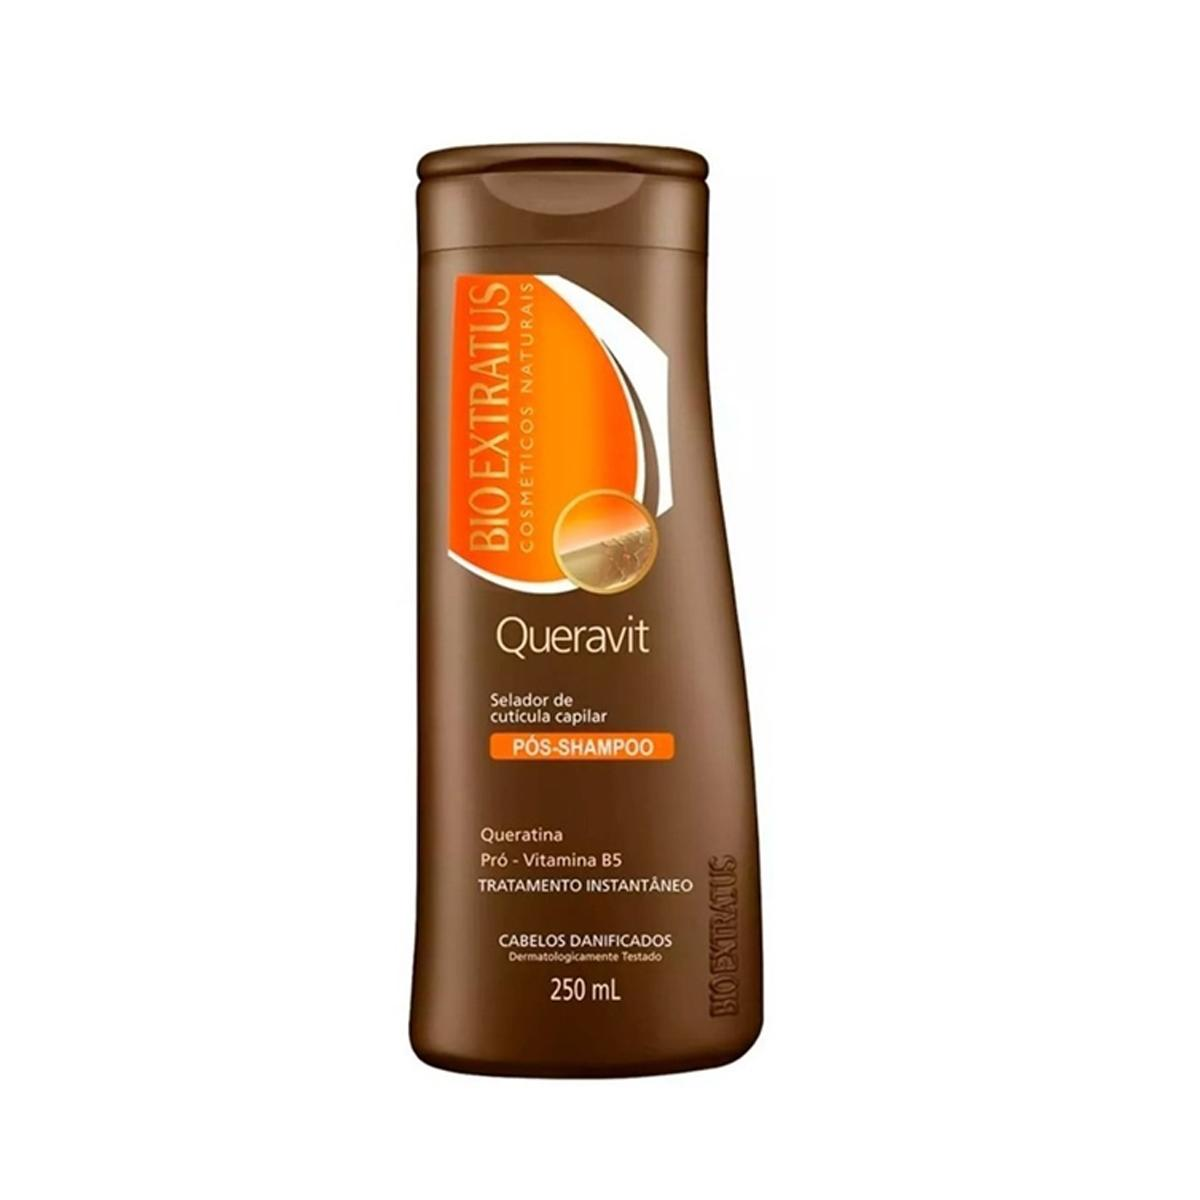 Bio Extratus Queravit Pós-Shampoo 250ml